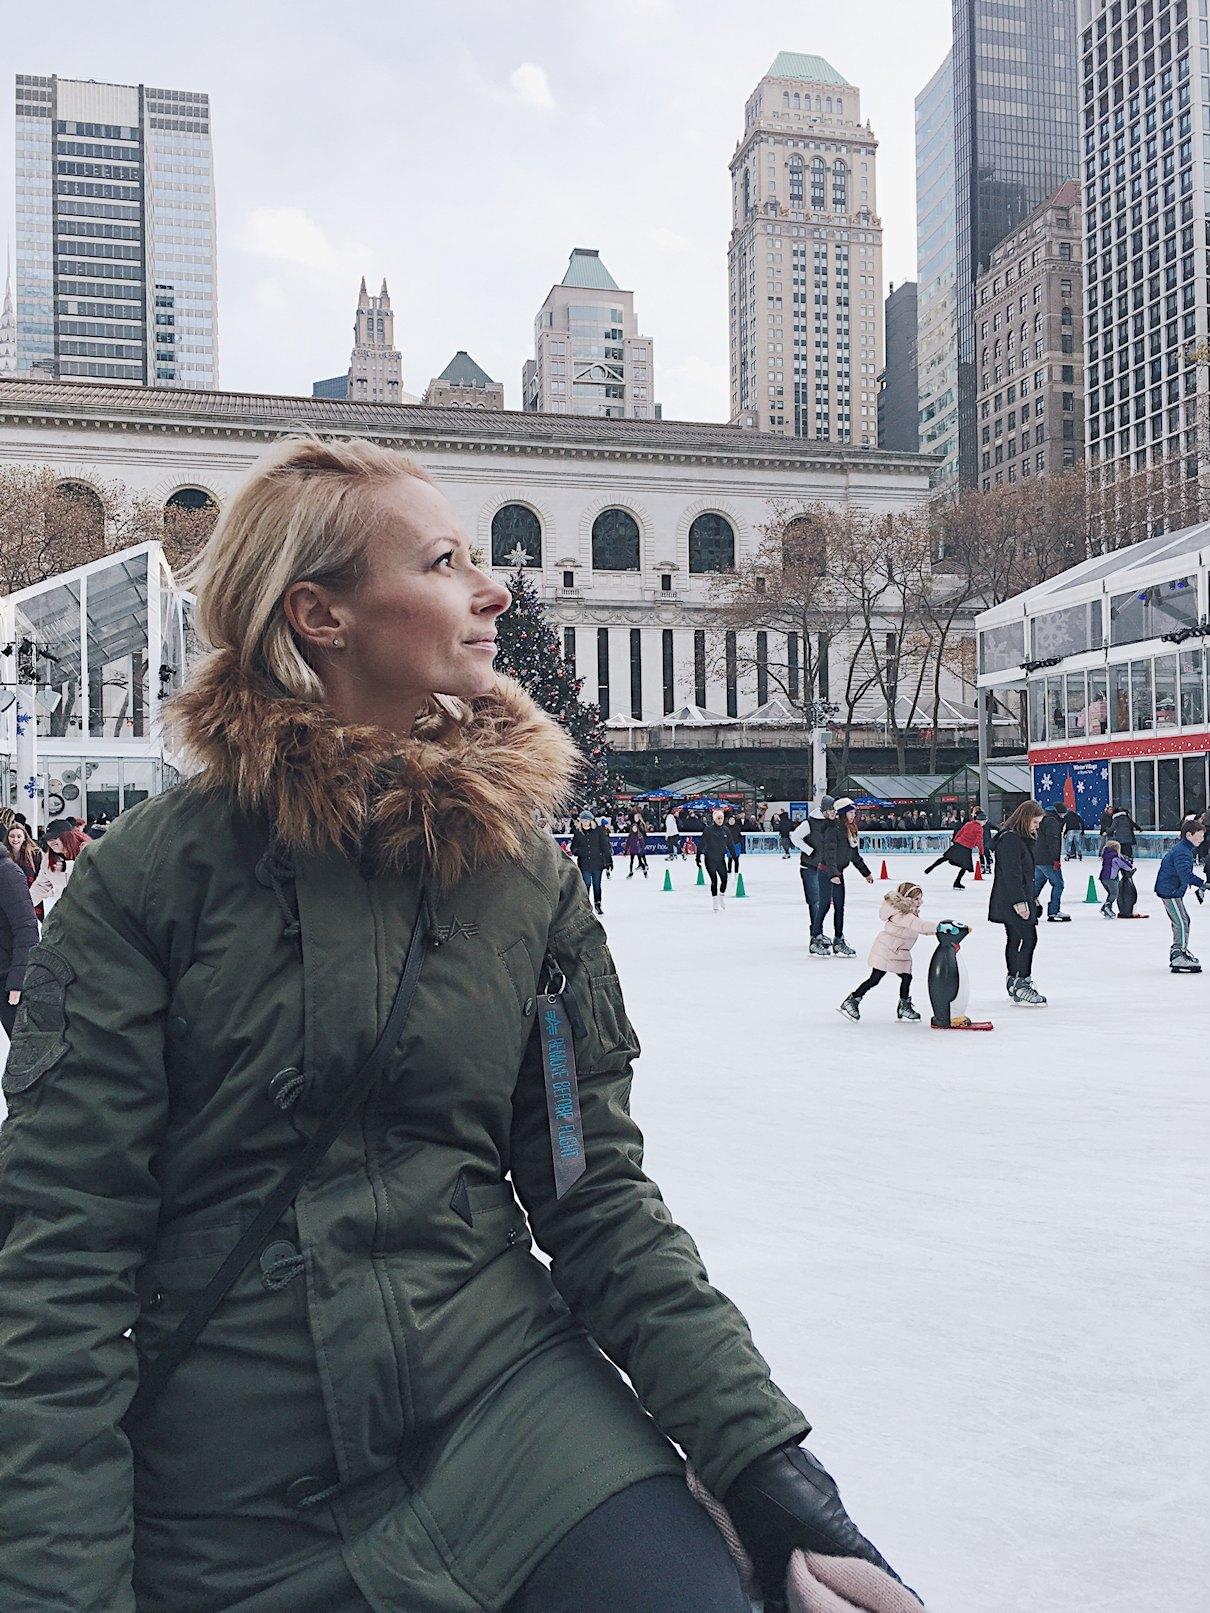 USA, Nowy Jork, Bryant Park